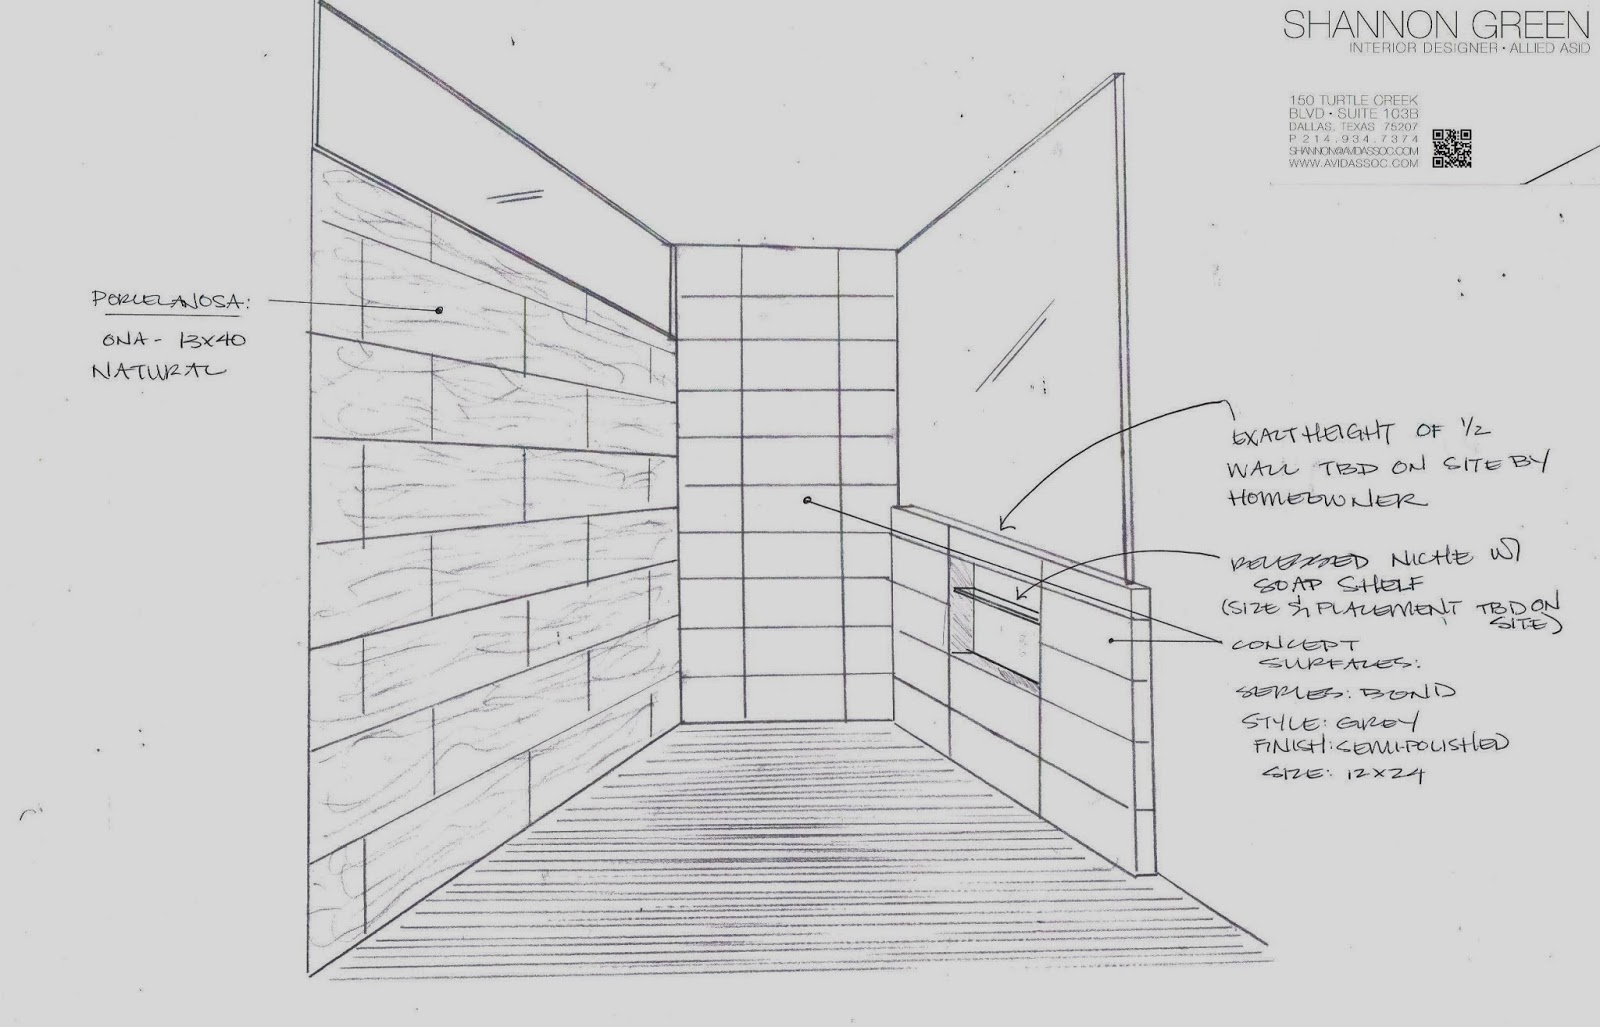 Drain Tile Floor In Basement | Wiring Diagram Database